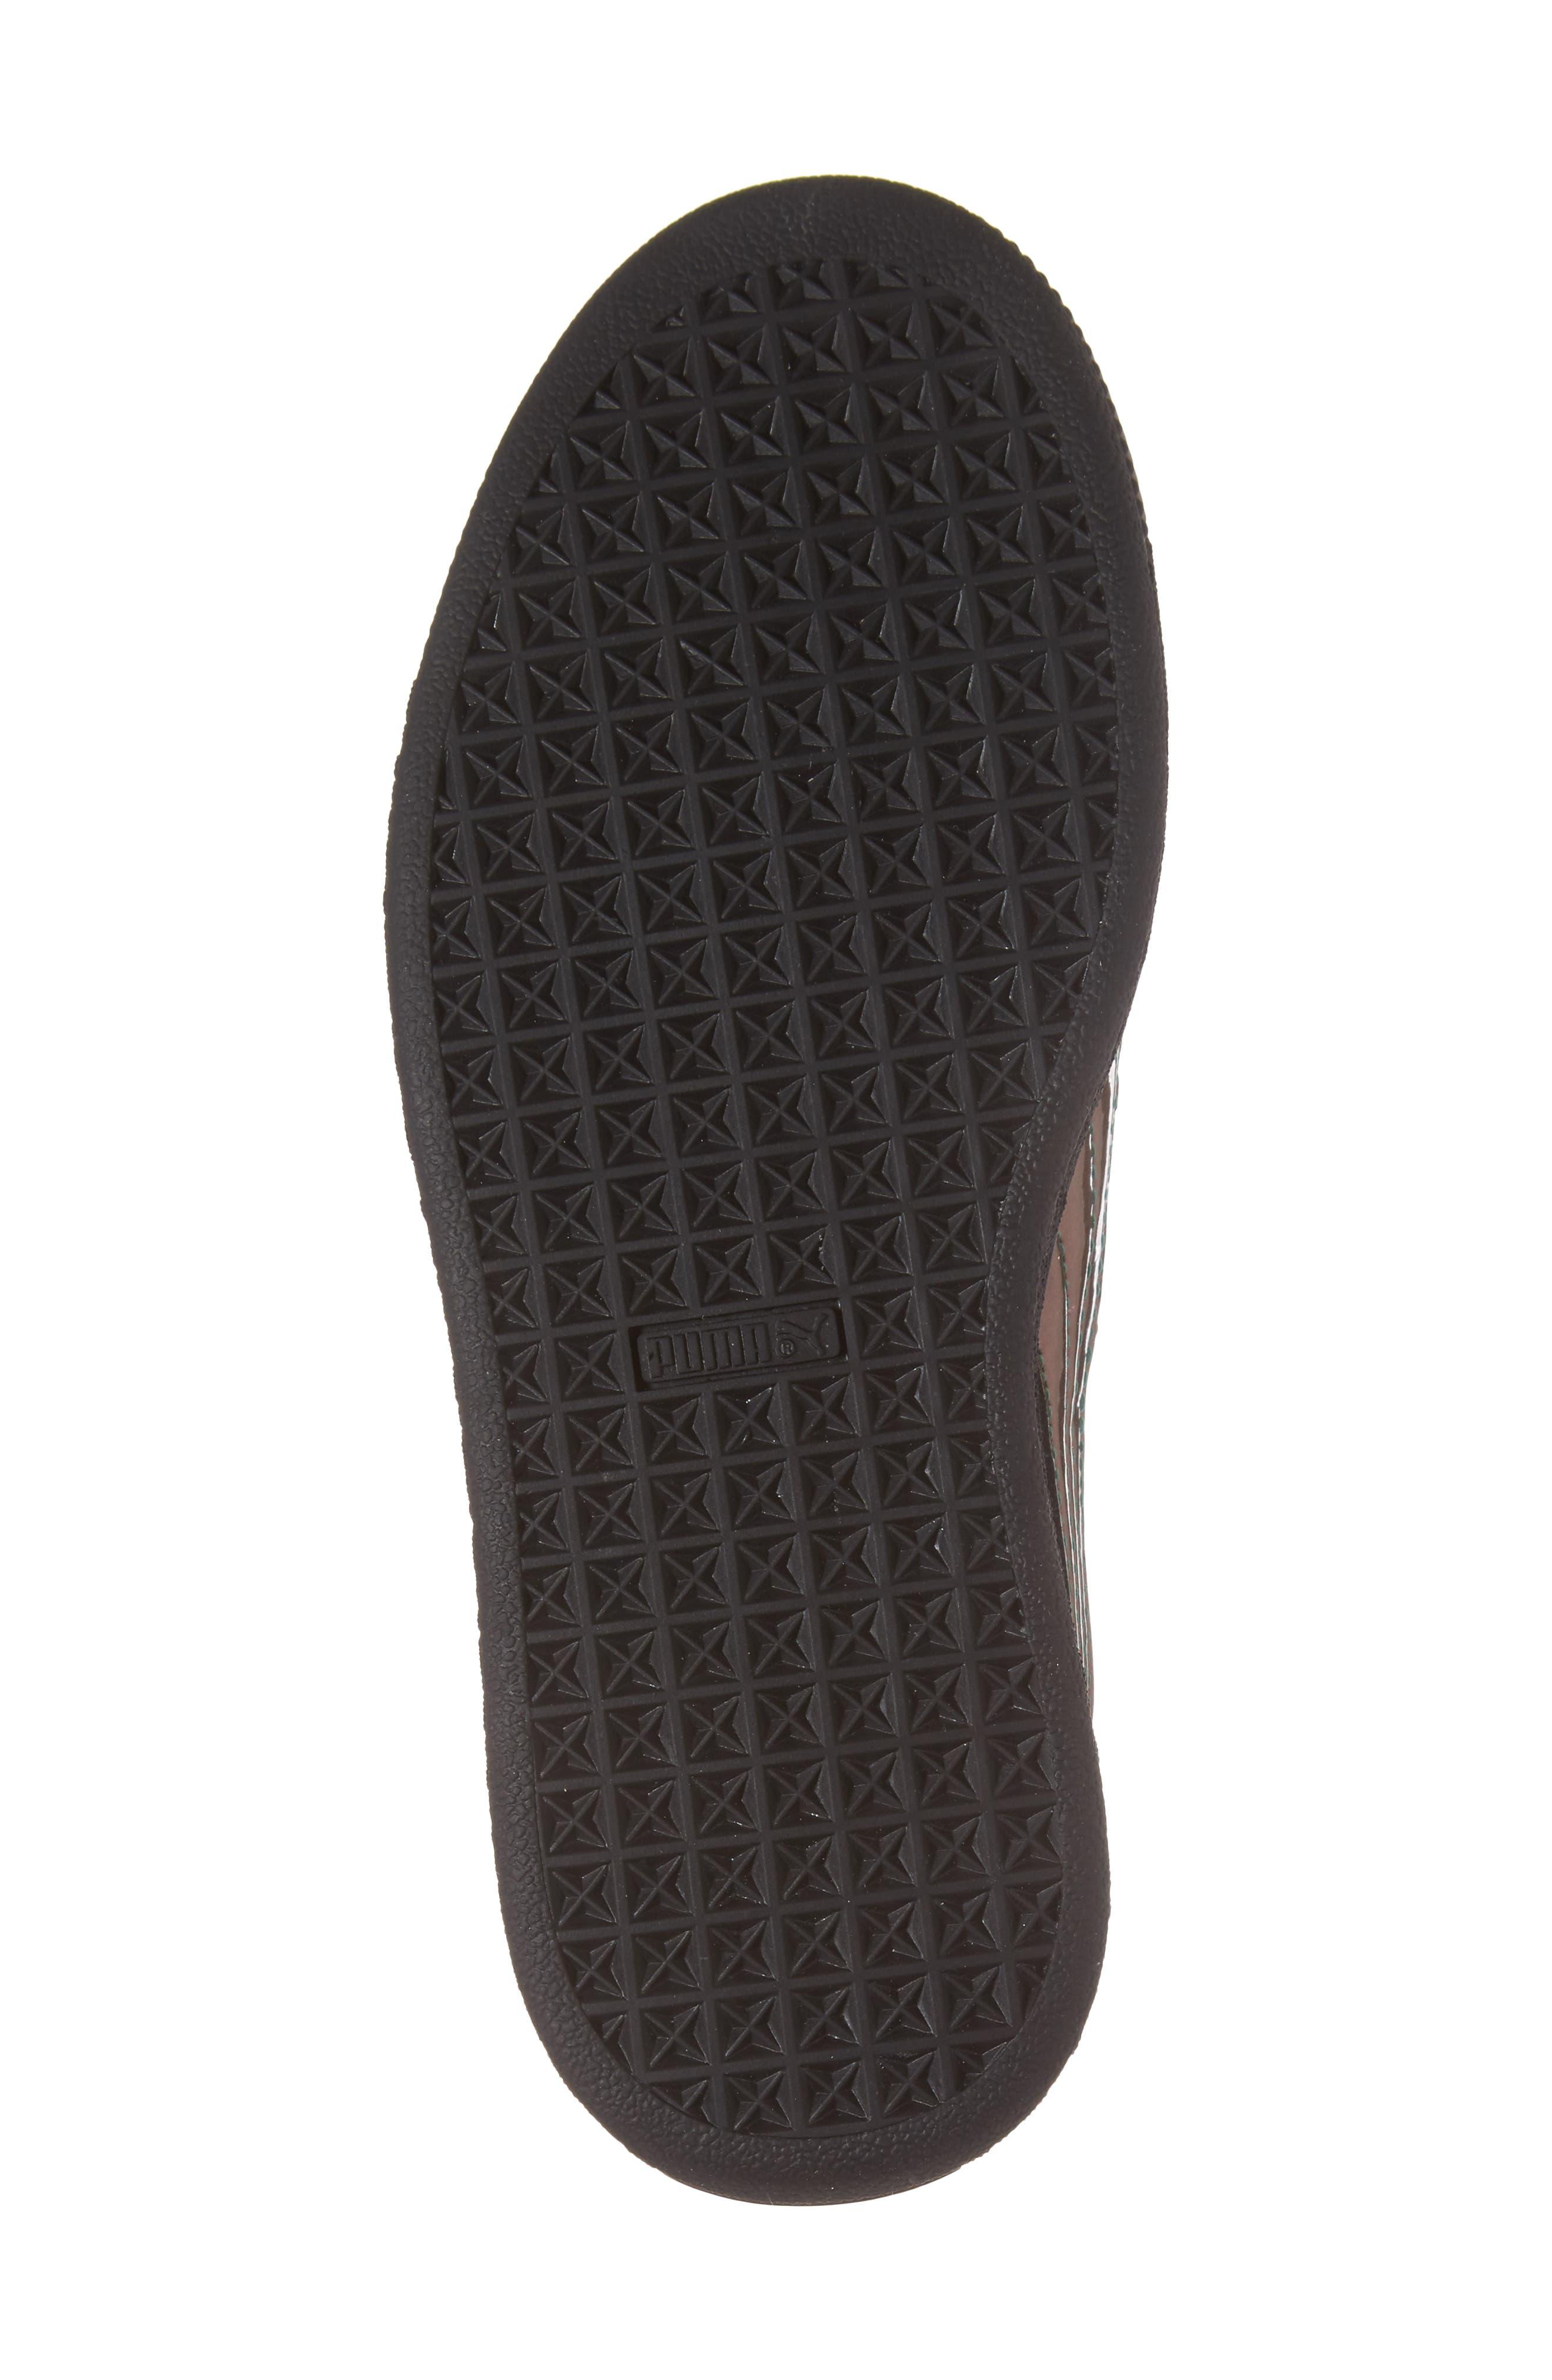 Basket Classic Holo PS Sneaker,                             Alternate thumbnail 6, color,                             Black/ Black